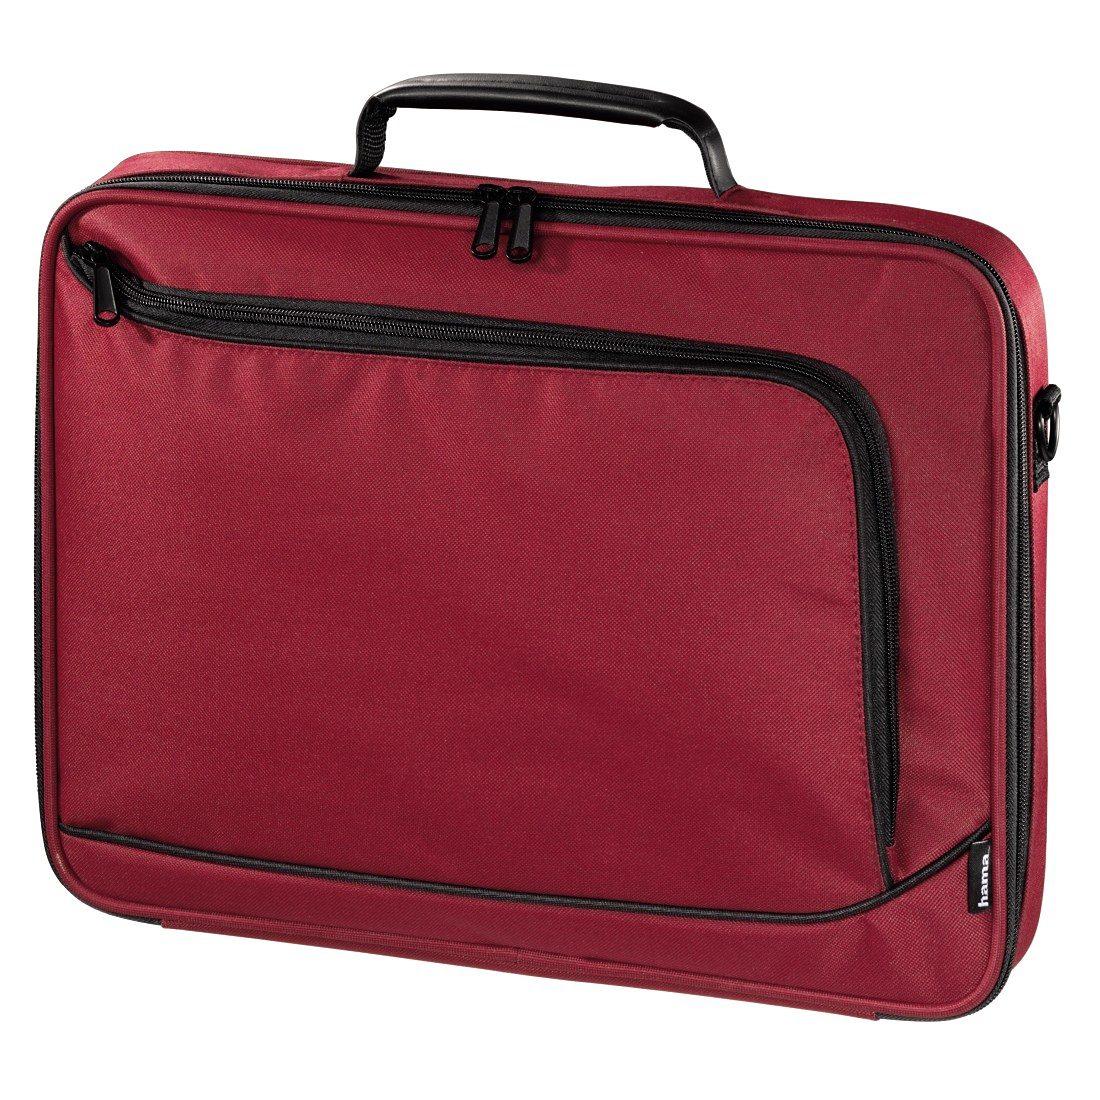 Hama Notebook-Tasche Sportsline Bordeaux bis 40 cm (15,6), Rot